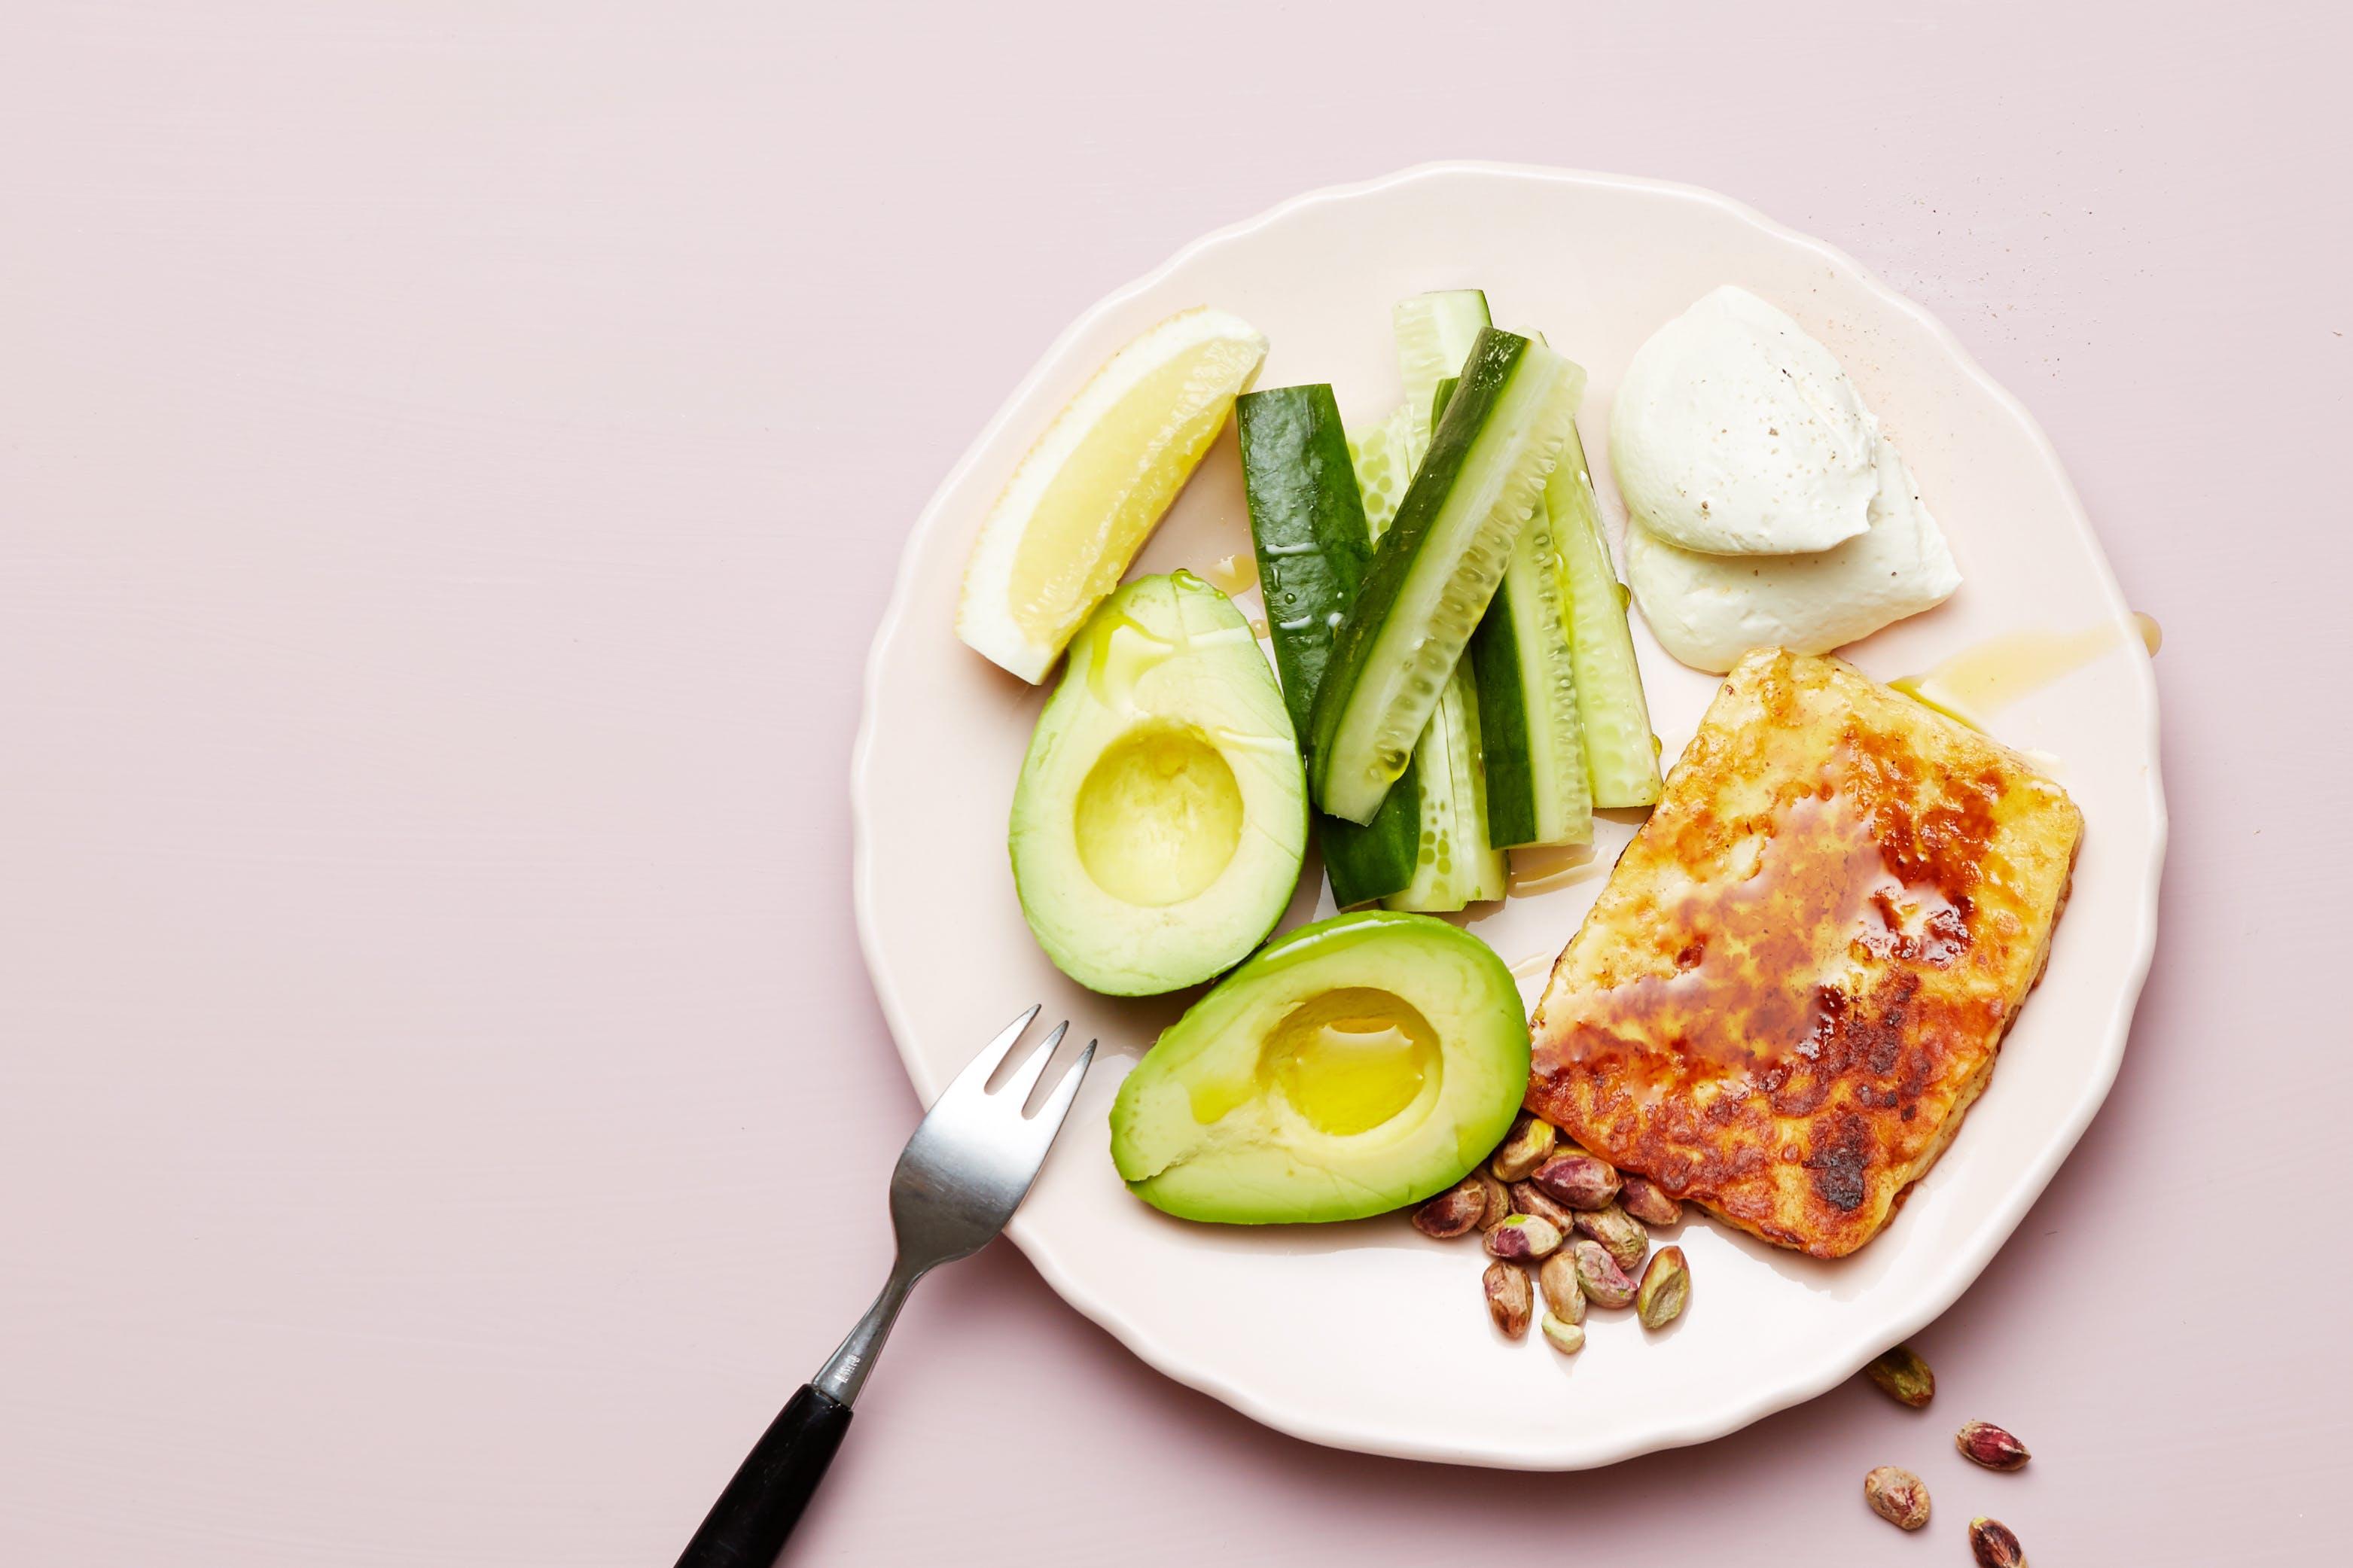 Keto Halloumi cheese and avocado plate